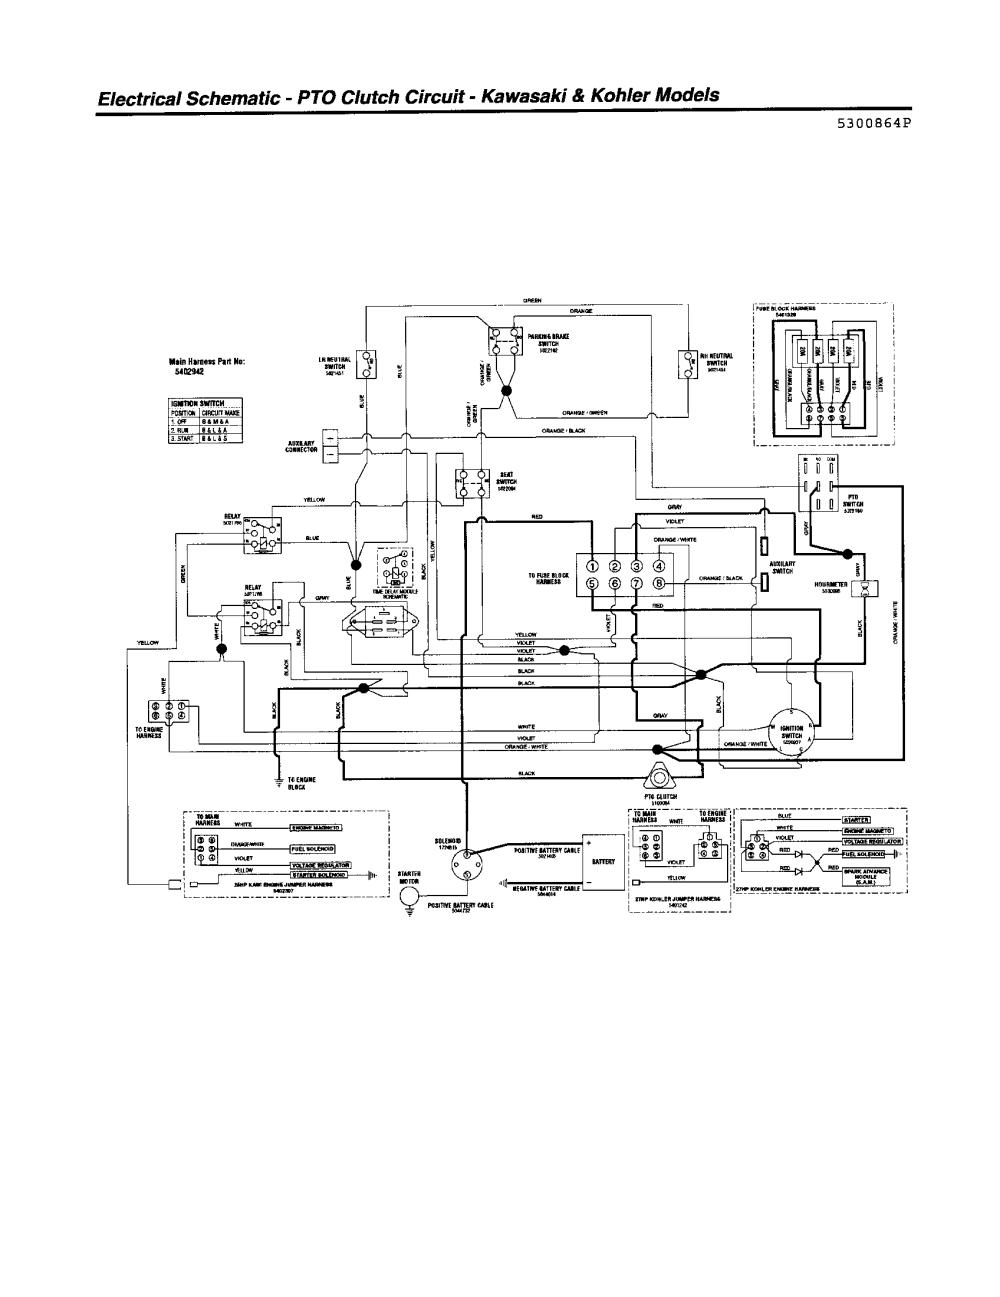 medium resolution of  edd203c96939fe65be99faf05b27f9f2 country clipper jazee mowers wiring diagrams country clipper avital 3100 car alarm wiring diagram at